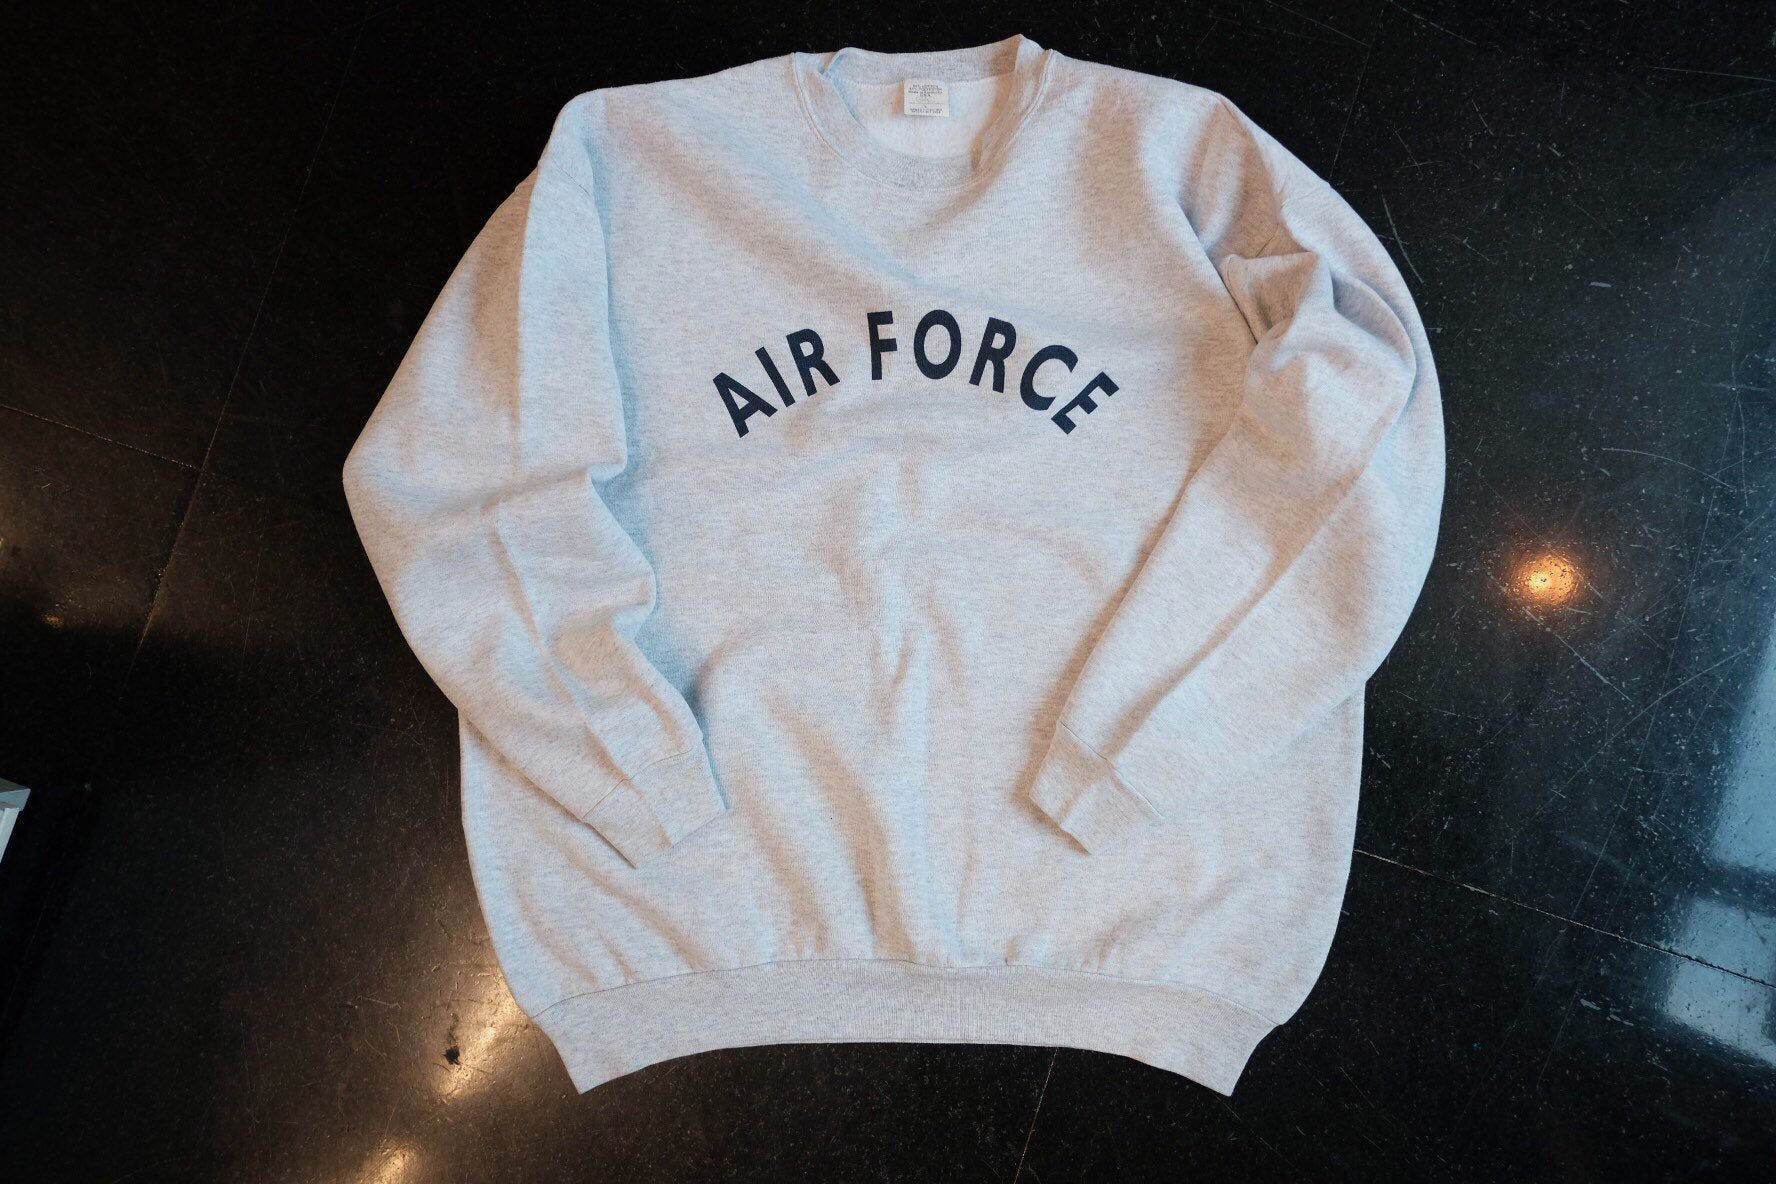 Air Force Sweatshirt 90s Sweatshirt Size L Etsy Air Force Sweatshirt Sweatshirts 90s Sweatshirt [ 1184 x 1776 Pixel ]